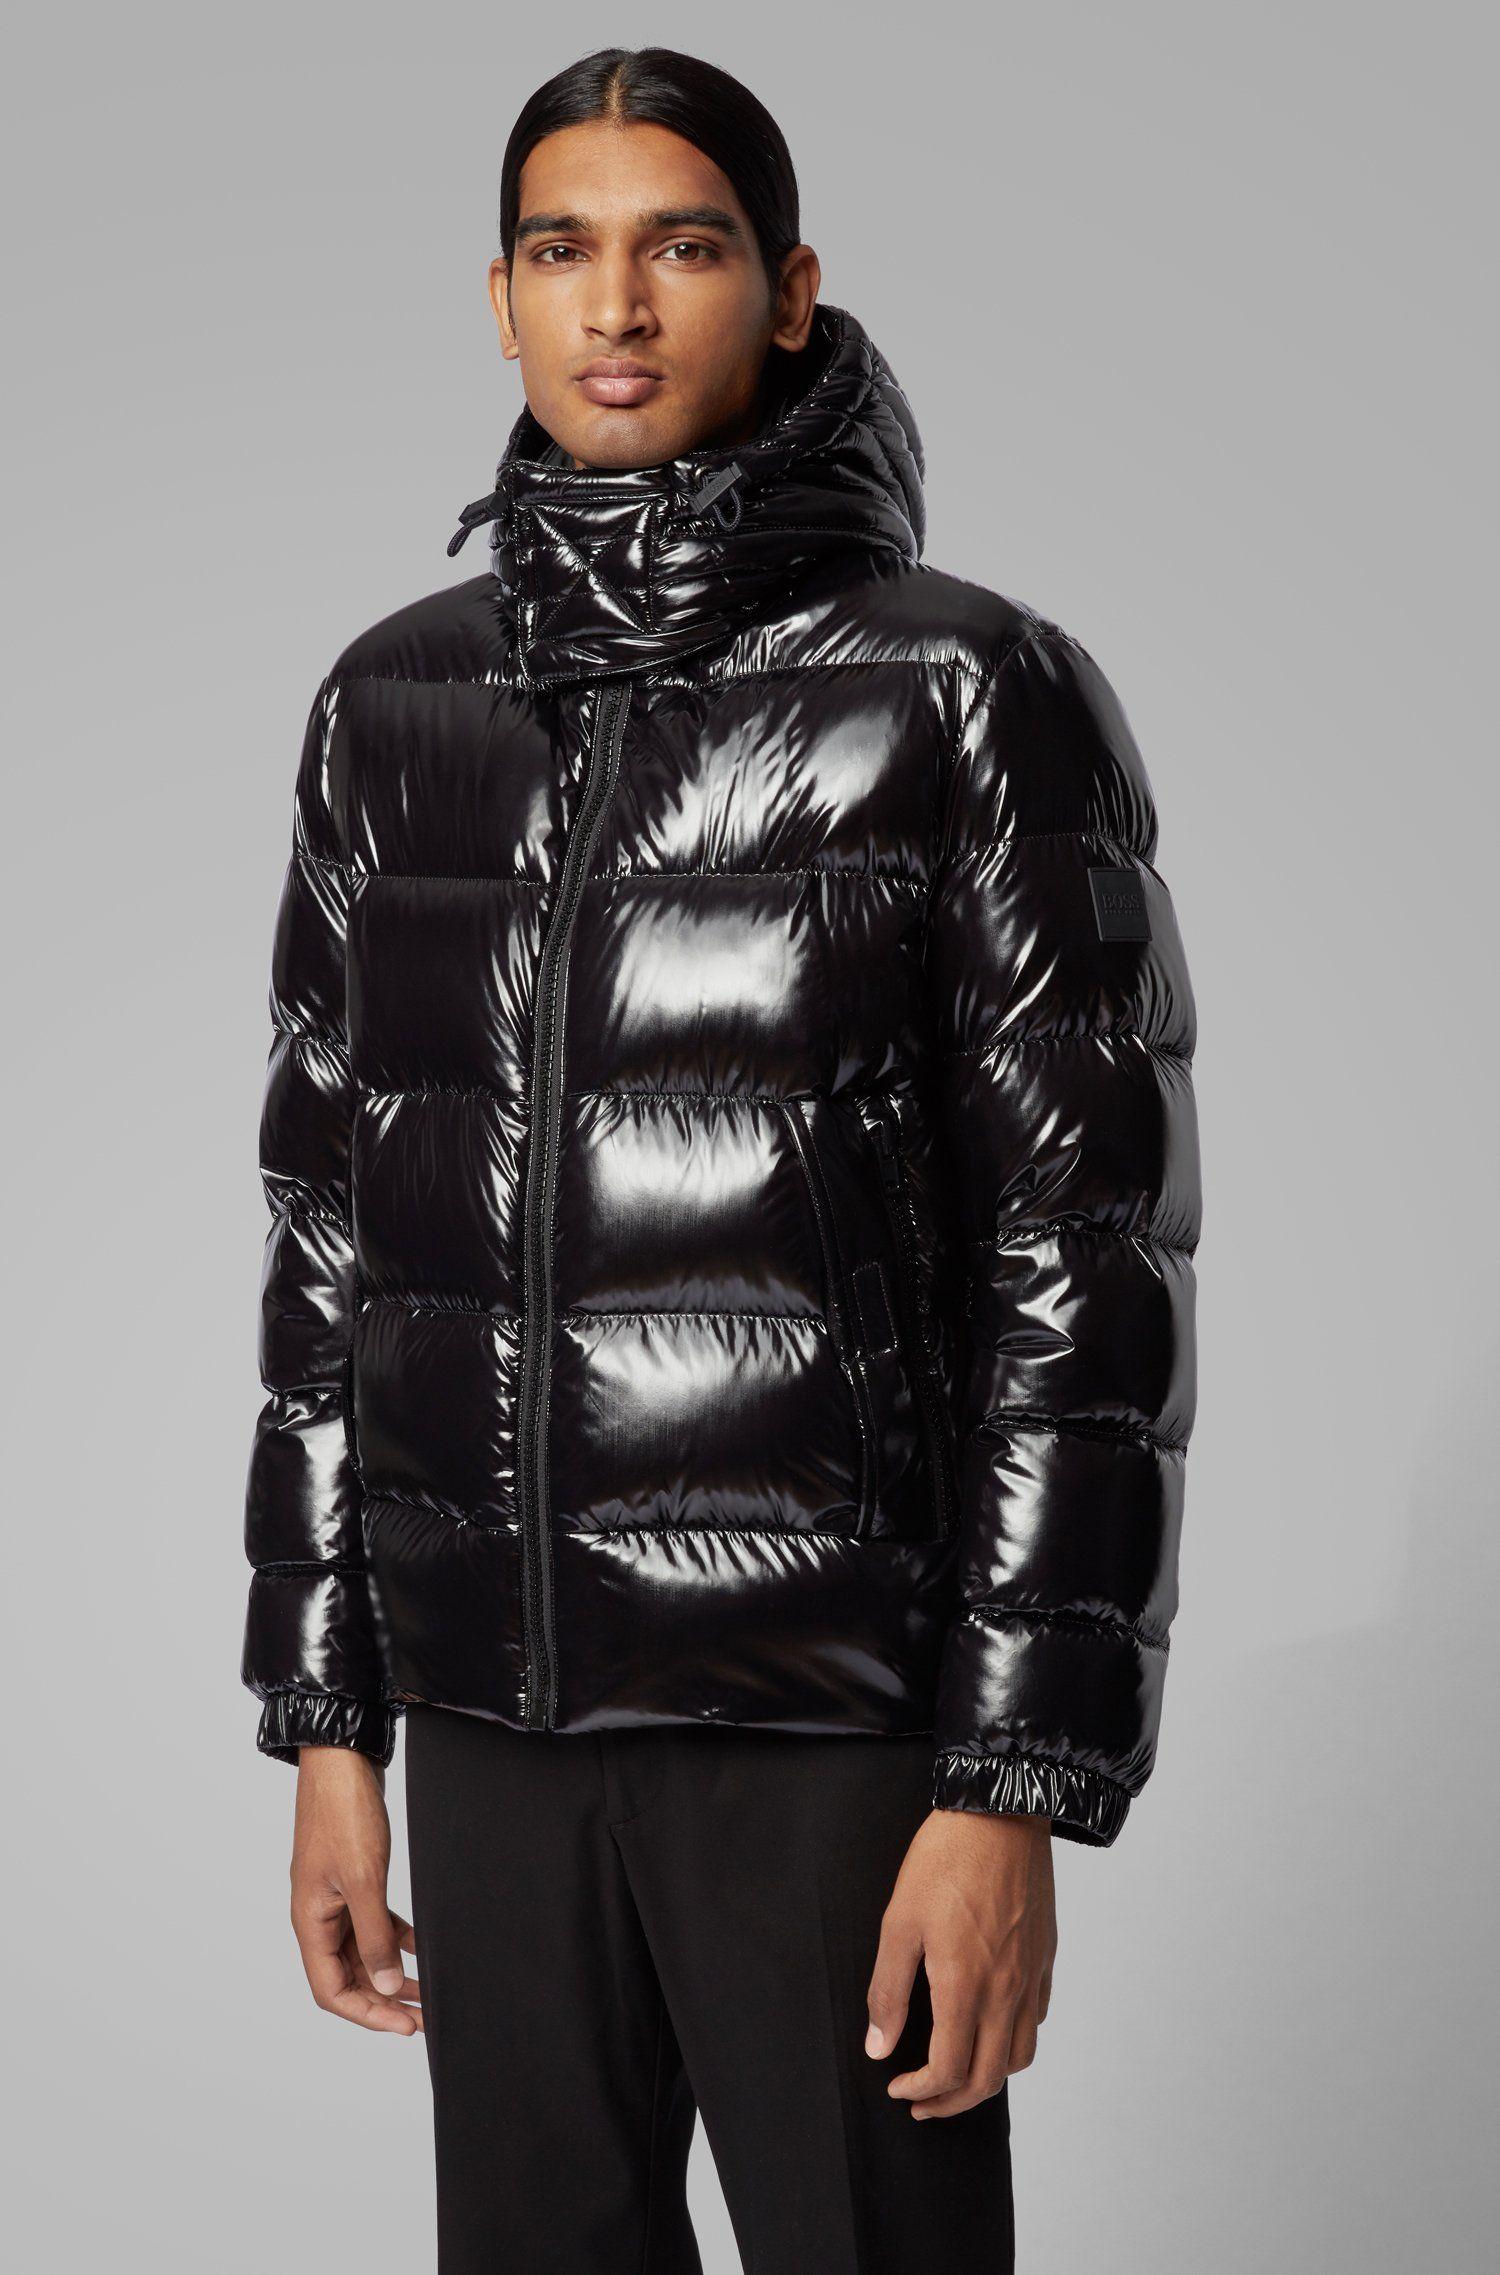 Boss Regular Fit Down Jacket In Lustrous Fabric Down Jacket Jackets Puffy Jacket [ 2275 x 1500 Pixel ]